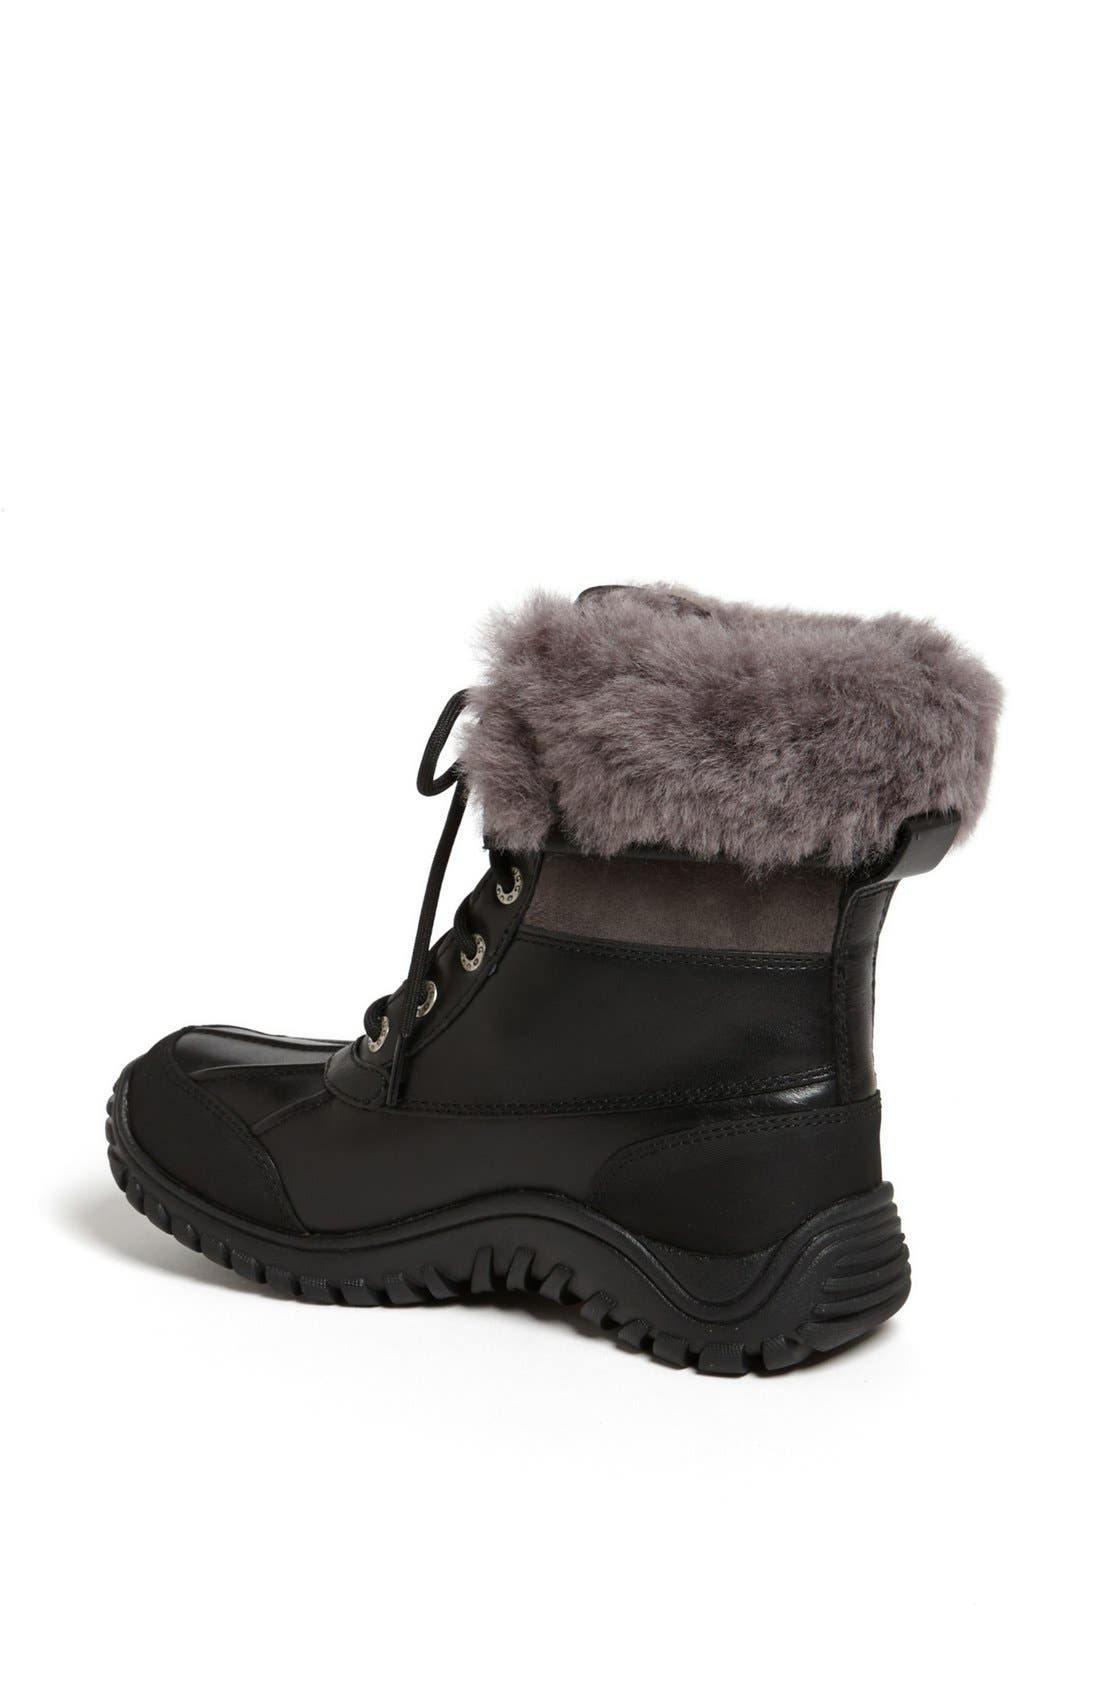 Alternate Image 2  - UGG® Adirondack II Waterproof Boot (Women)